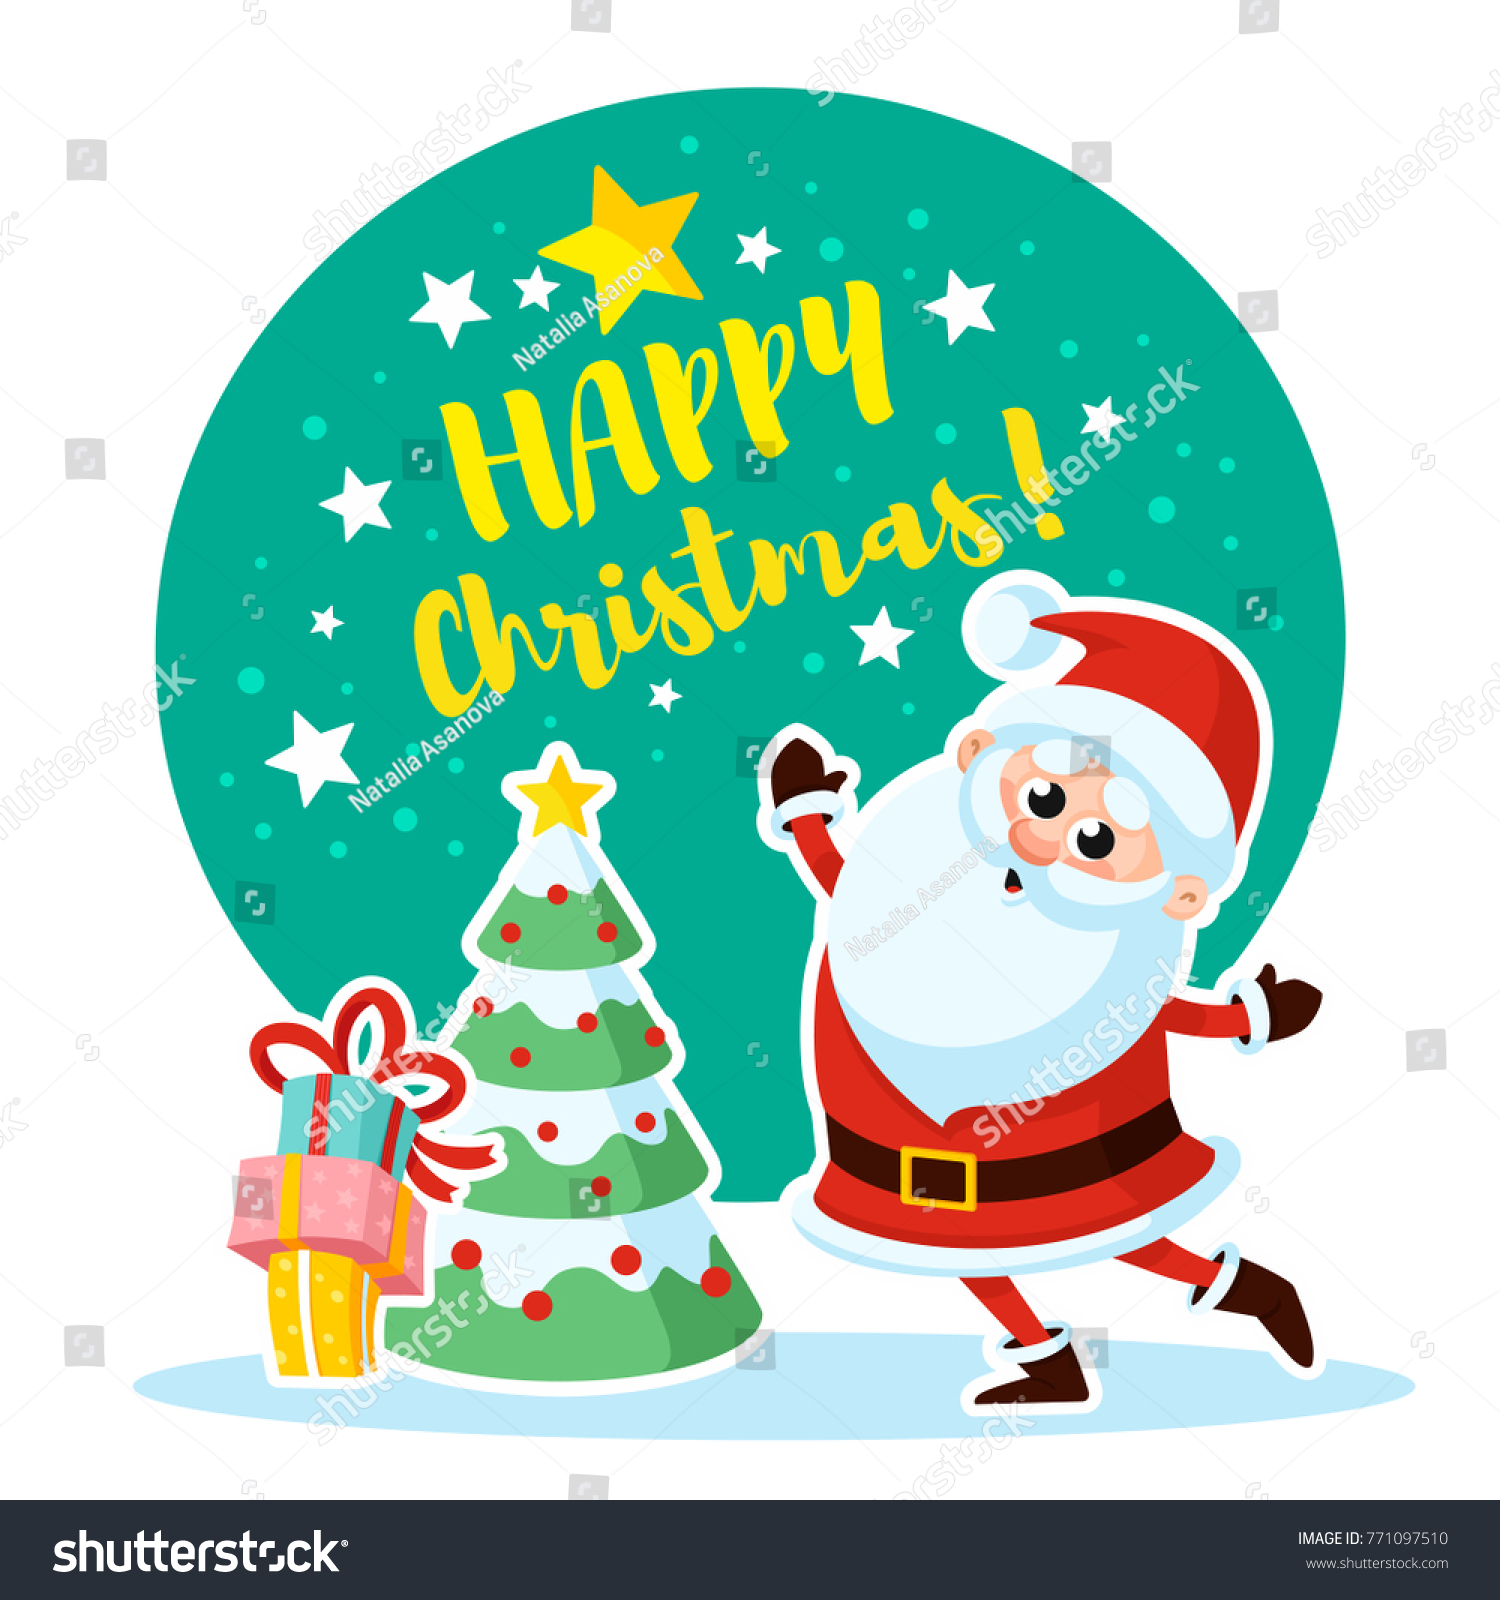 Santa Claus Gifts Christmas Tree Christmas Stock Vector Royalty